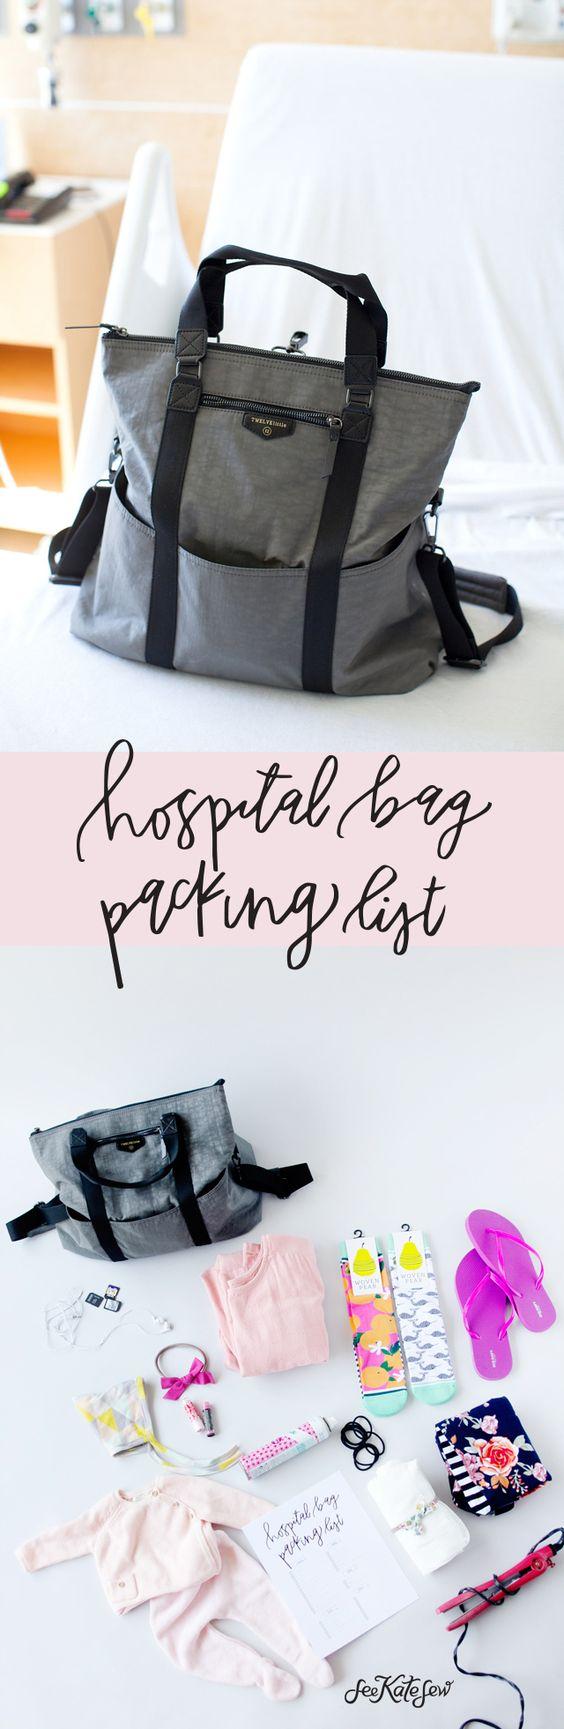 Printable Hospital Bag Packing List   See Kate Sew